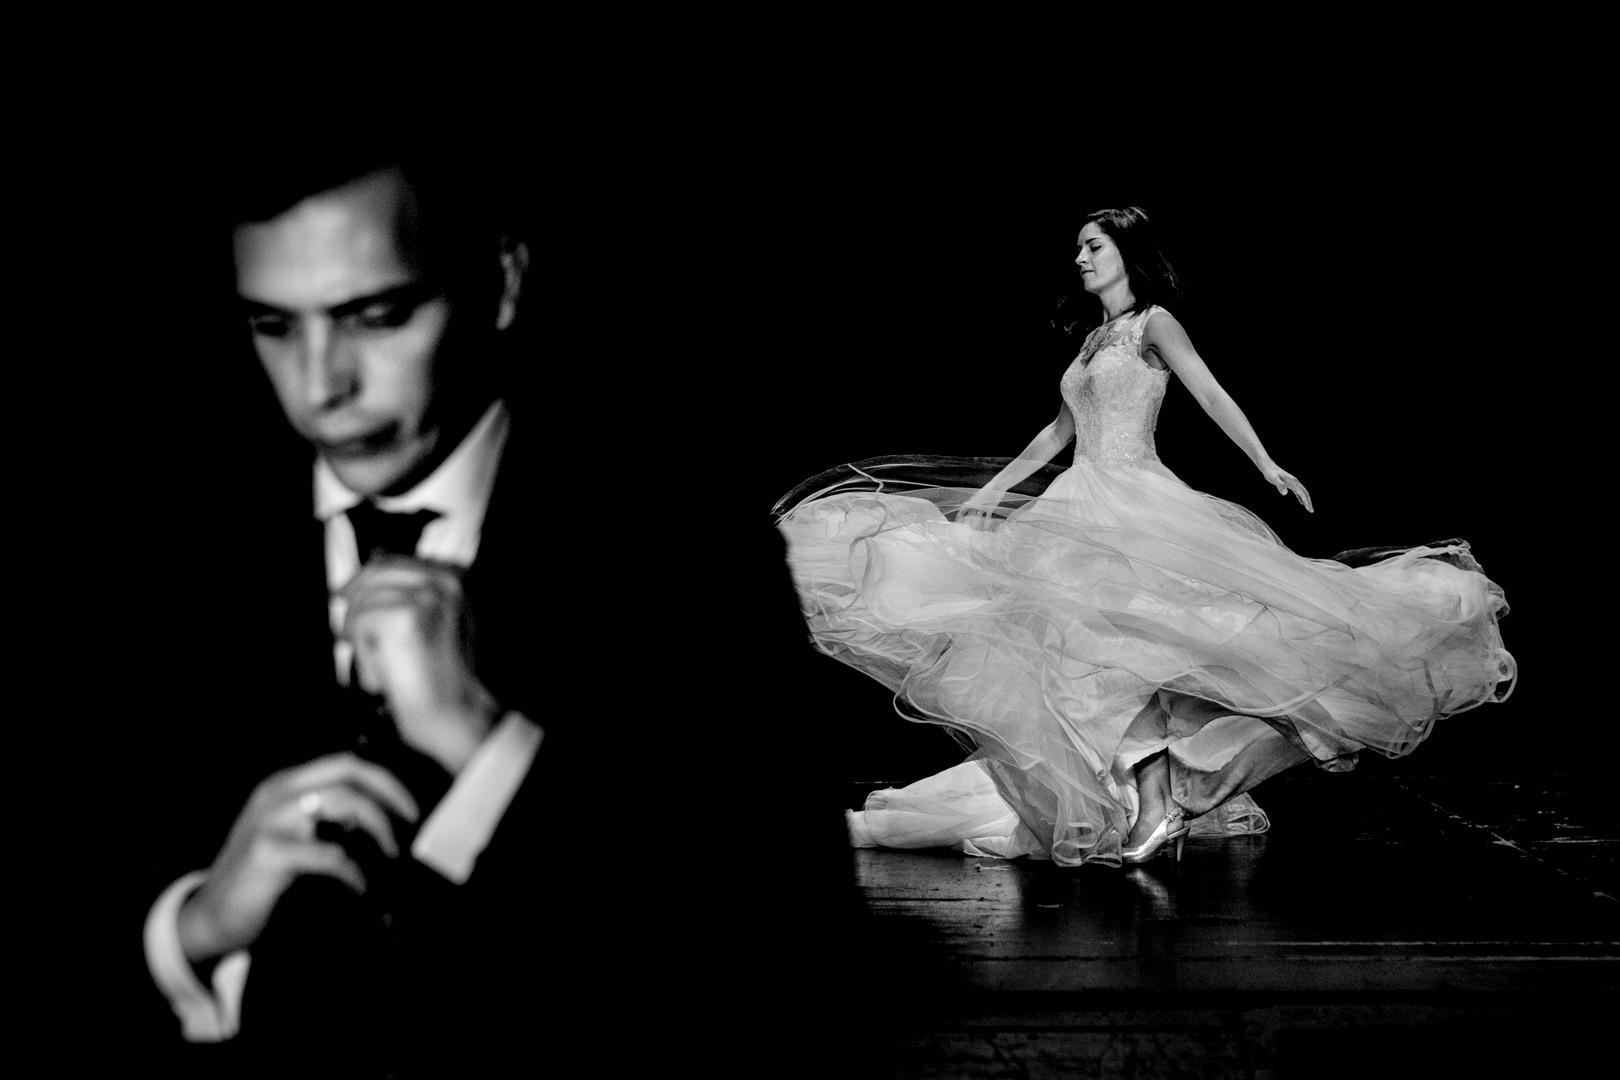 Postboda-Teatro-Cerezo-Carmona-engagement-Rafael-Torres-fotografo-bodas-sevilla-madrid-barcelona-wedding-photographer--4.jpg